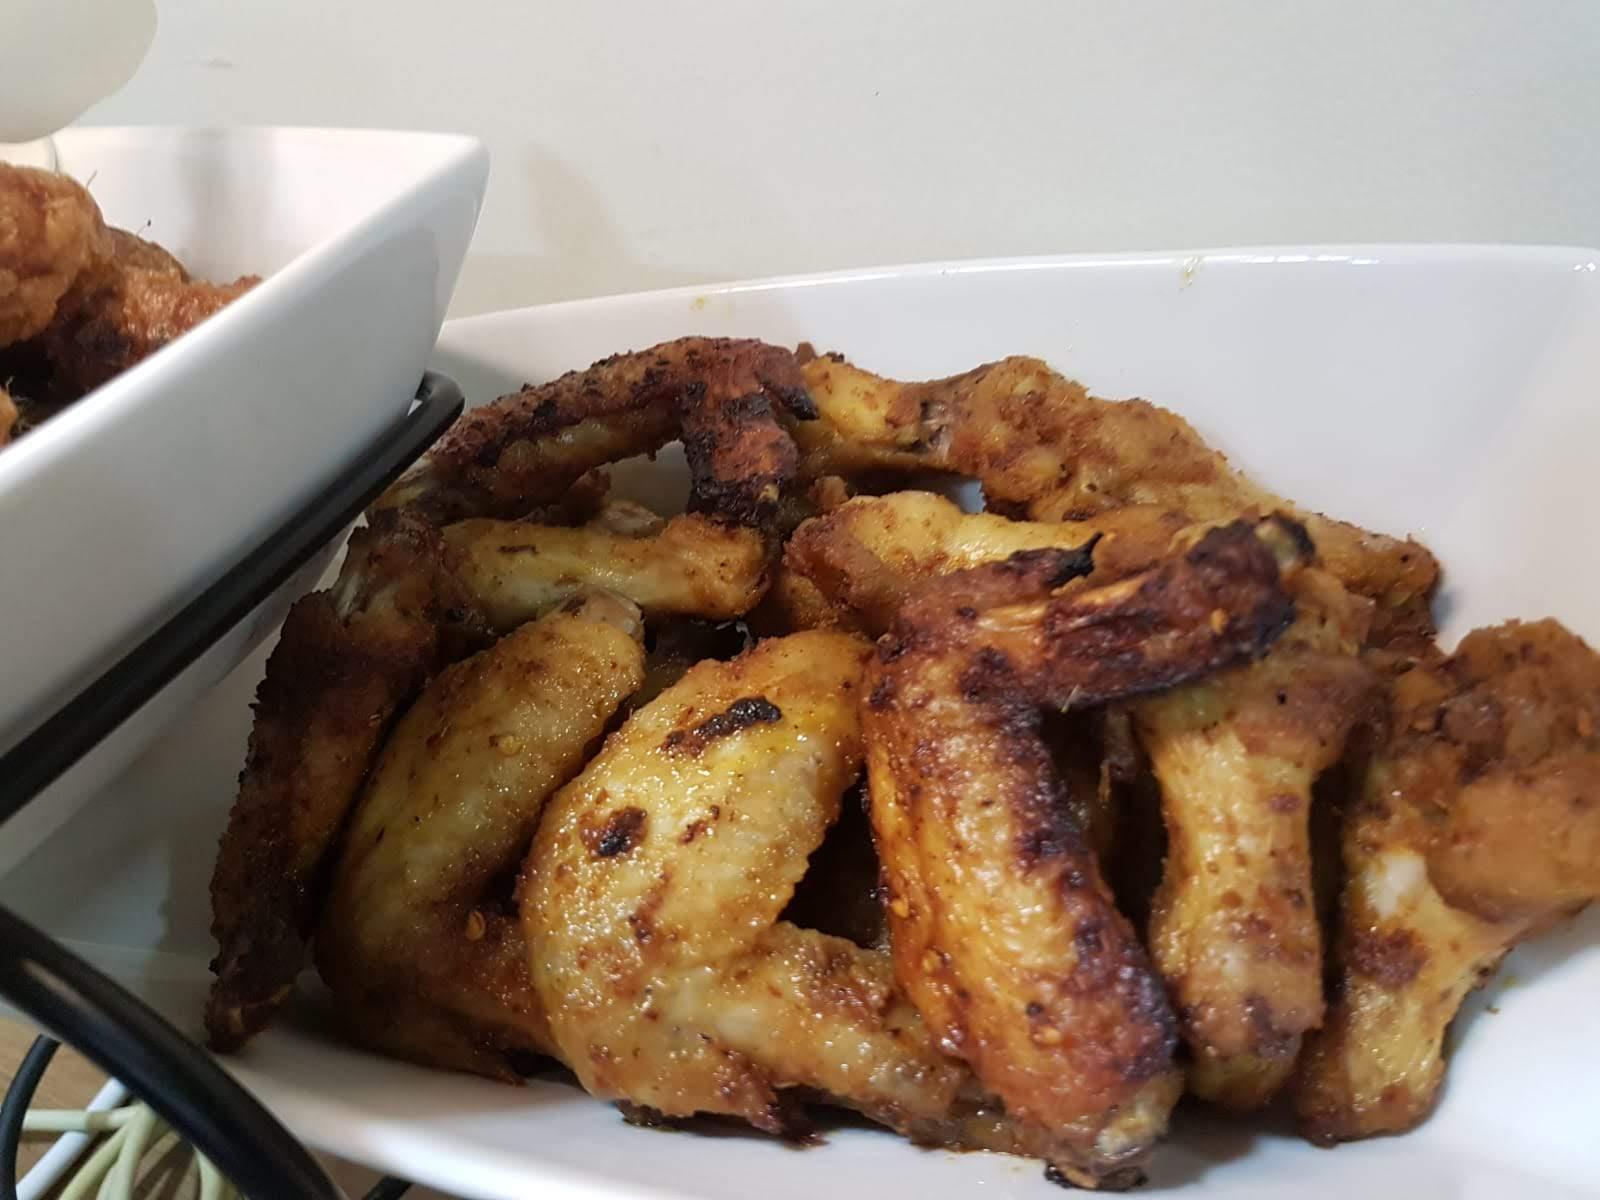 Spicy Belacan (Shrimp Paste) Fried Chicken